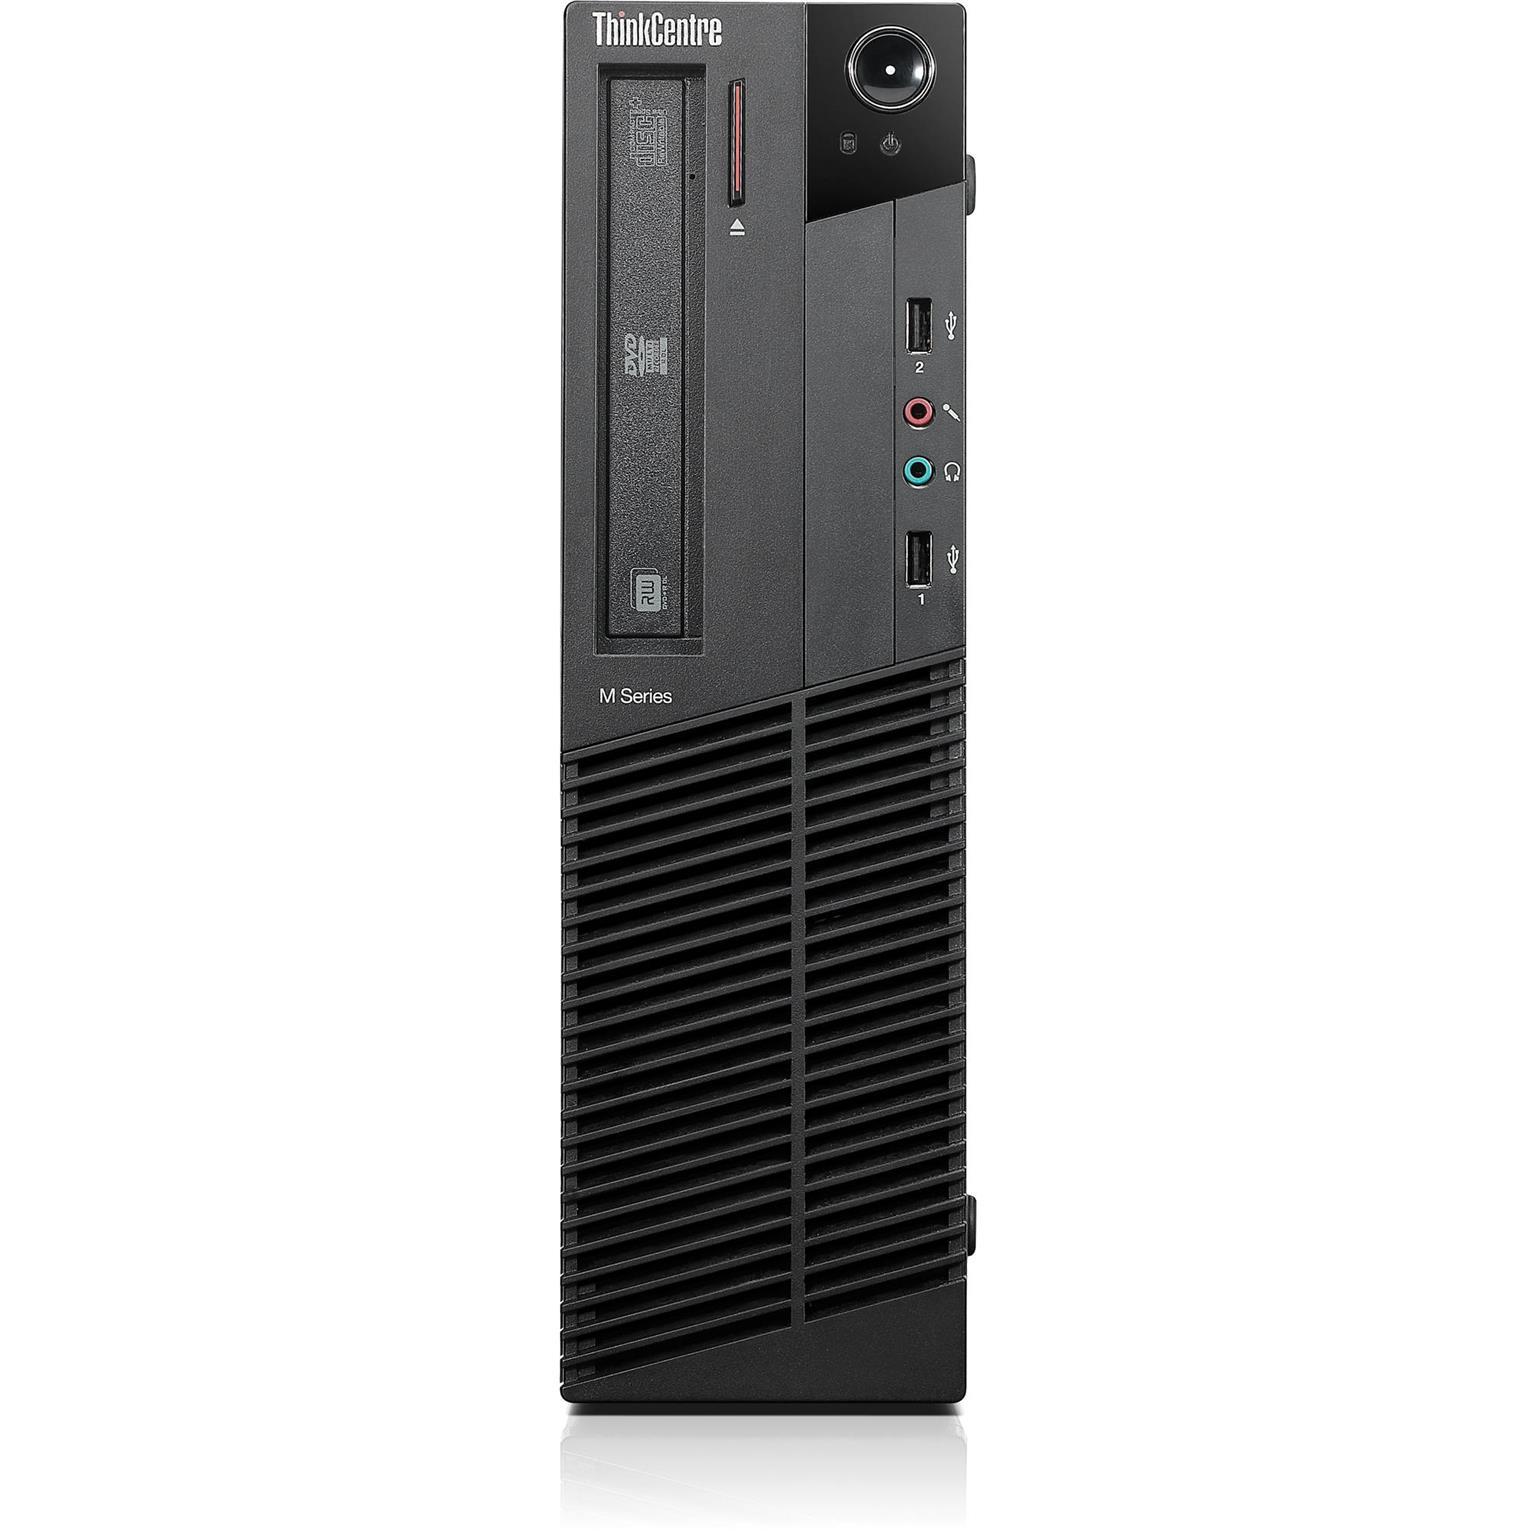 Lenovo ThinkCentre M91p Intel core i5 3.1GHz  8GB RAM 500GB Hard Drive